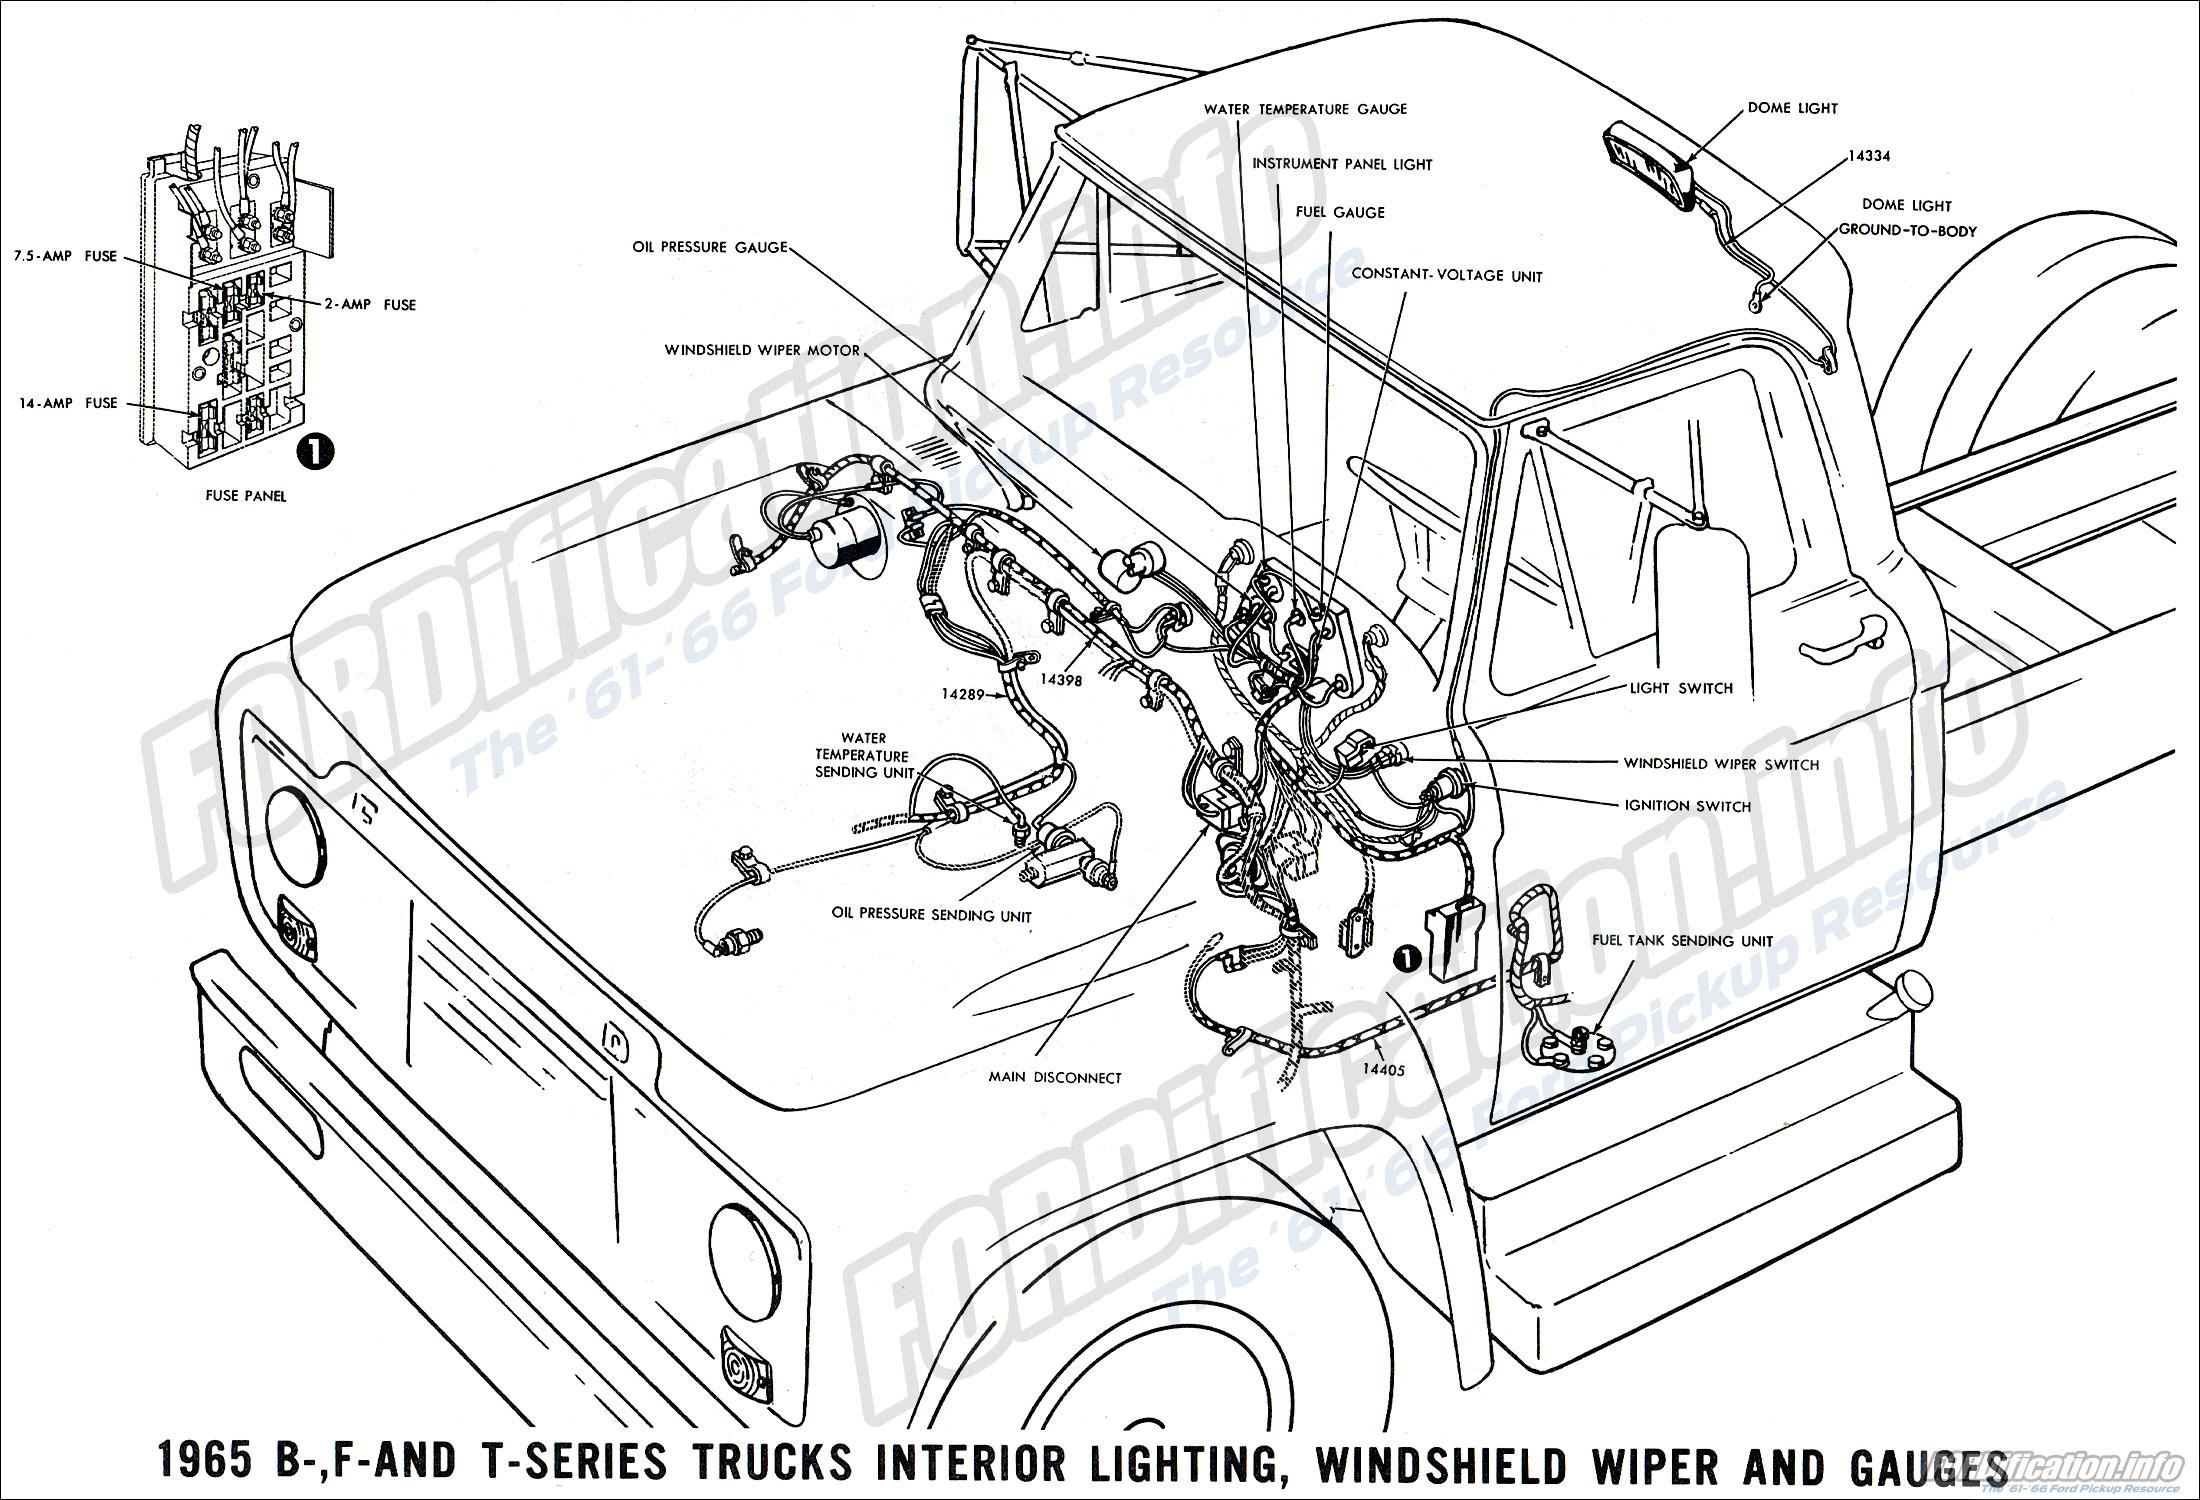 Air Conditioner Wiring Diagram 1966 Mustang Diagrams Corvette Conditioning Alternator